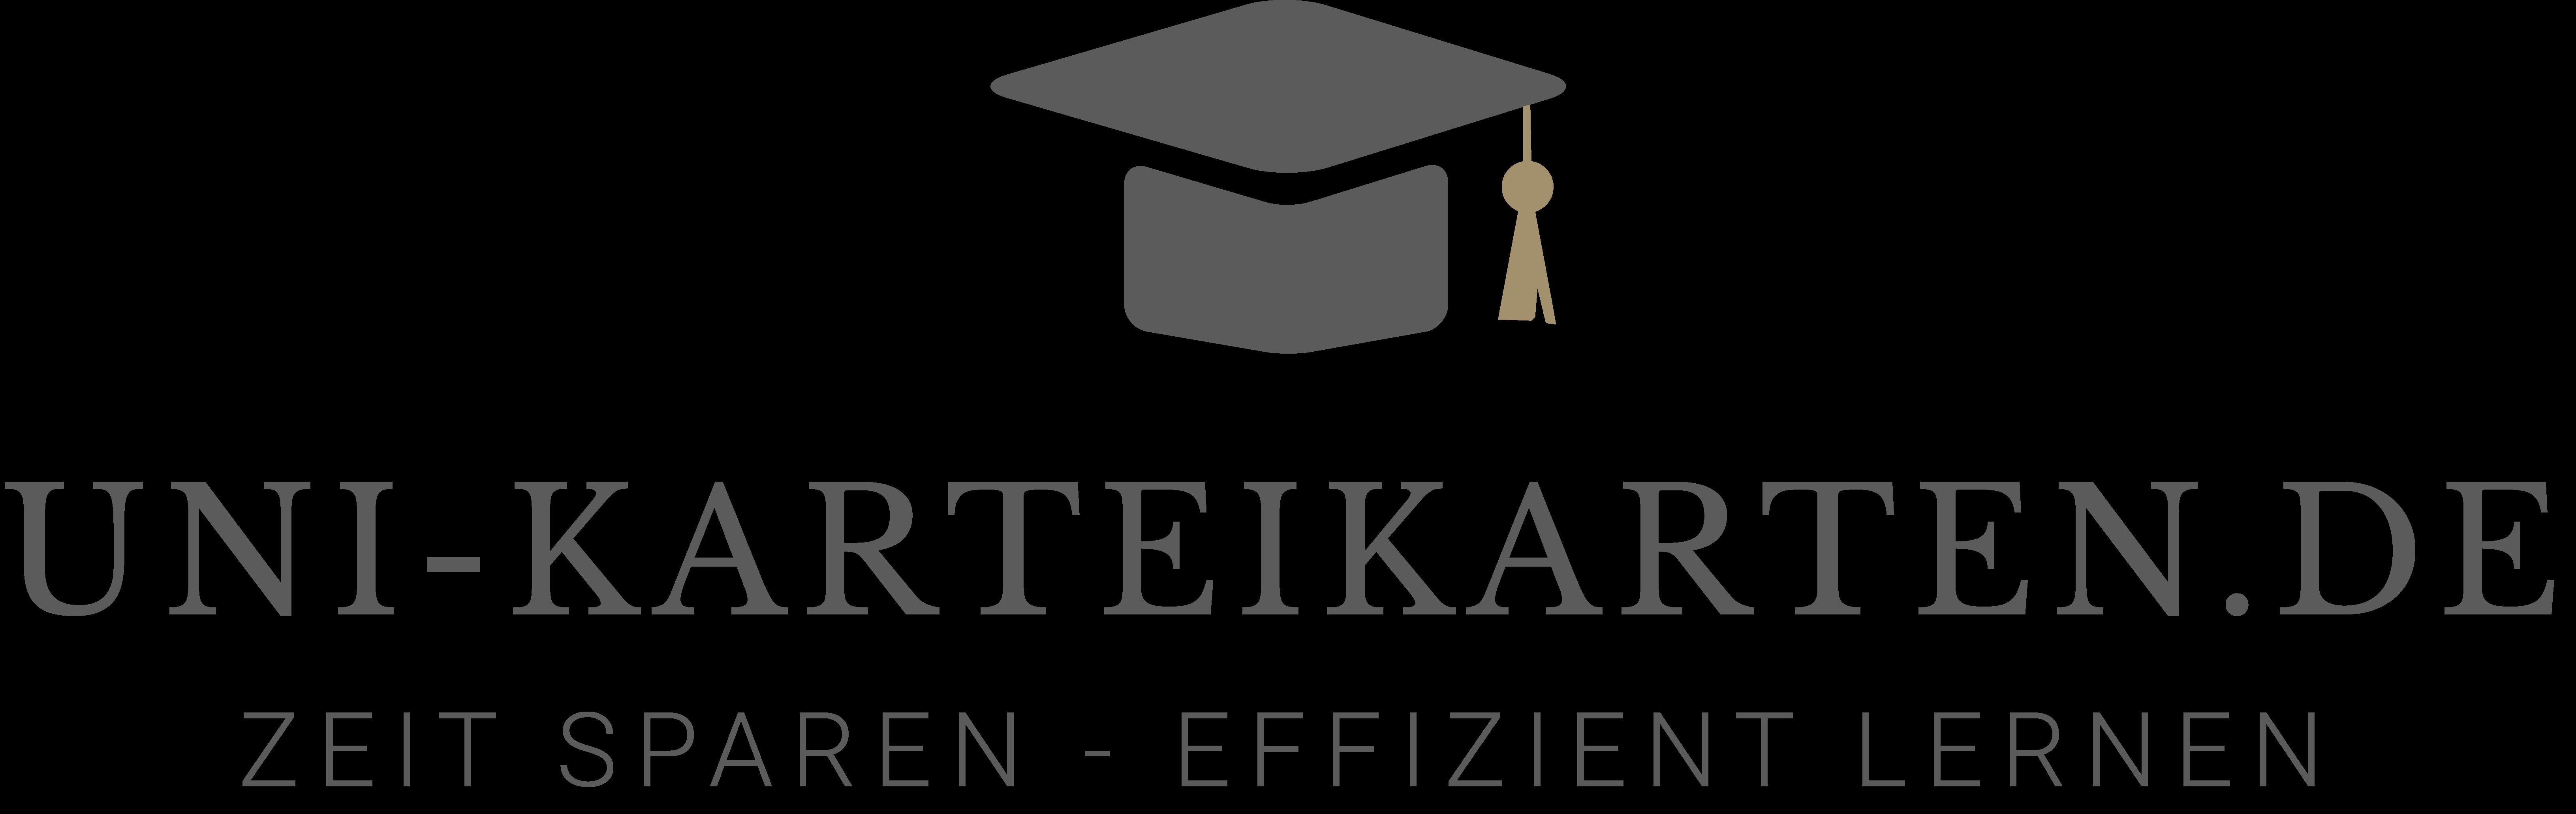 UNI-KARTEIKARTEN.de